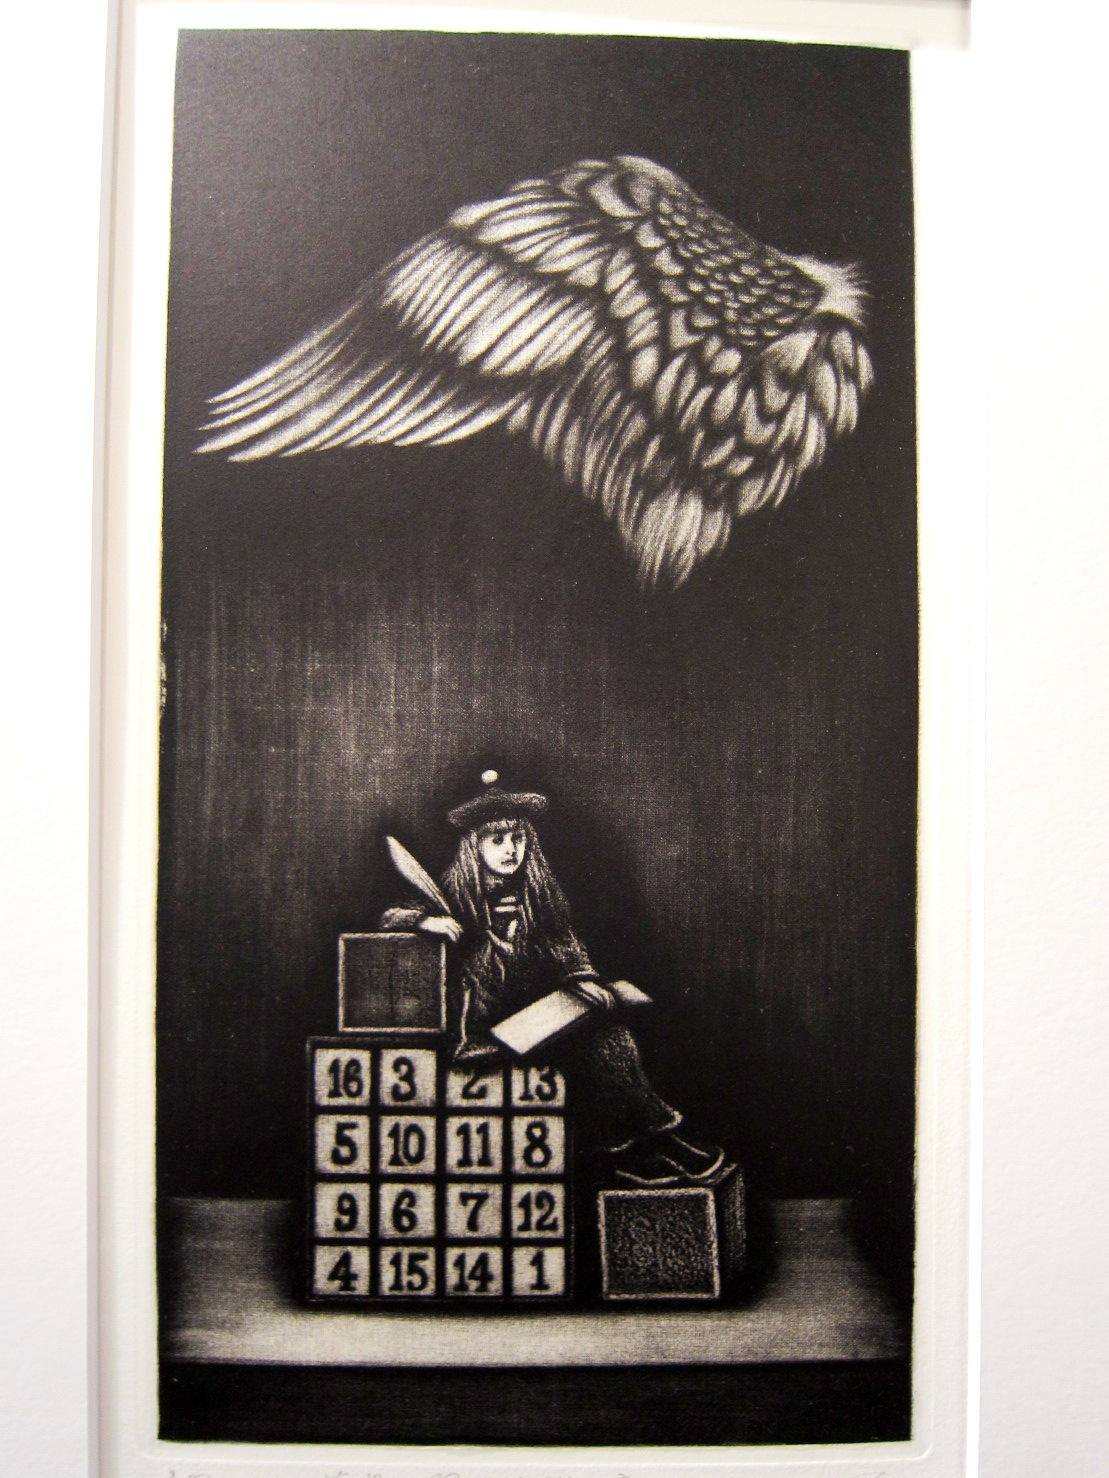 2296) 「川口巧海個展 『夜の詩学』」 g.犬養・お風呂 10月23日(水)~11月11日(月)  _f0126829_16113346.jpg